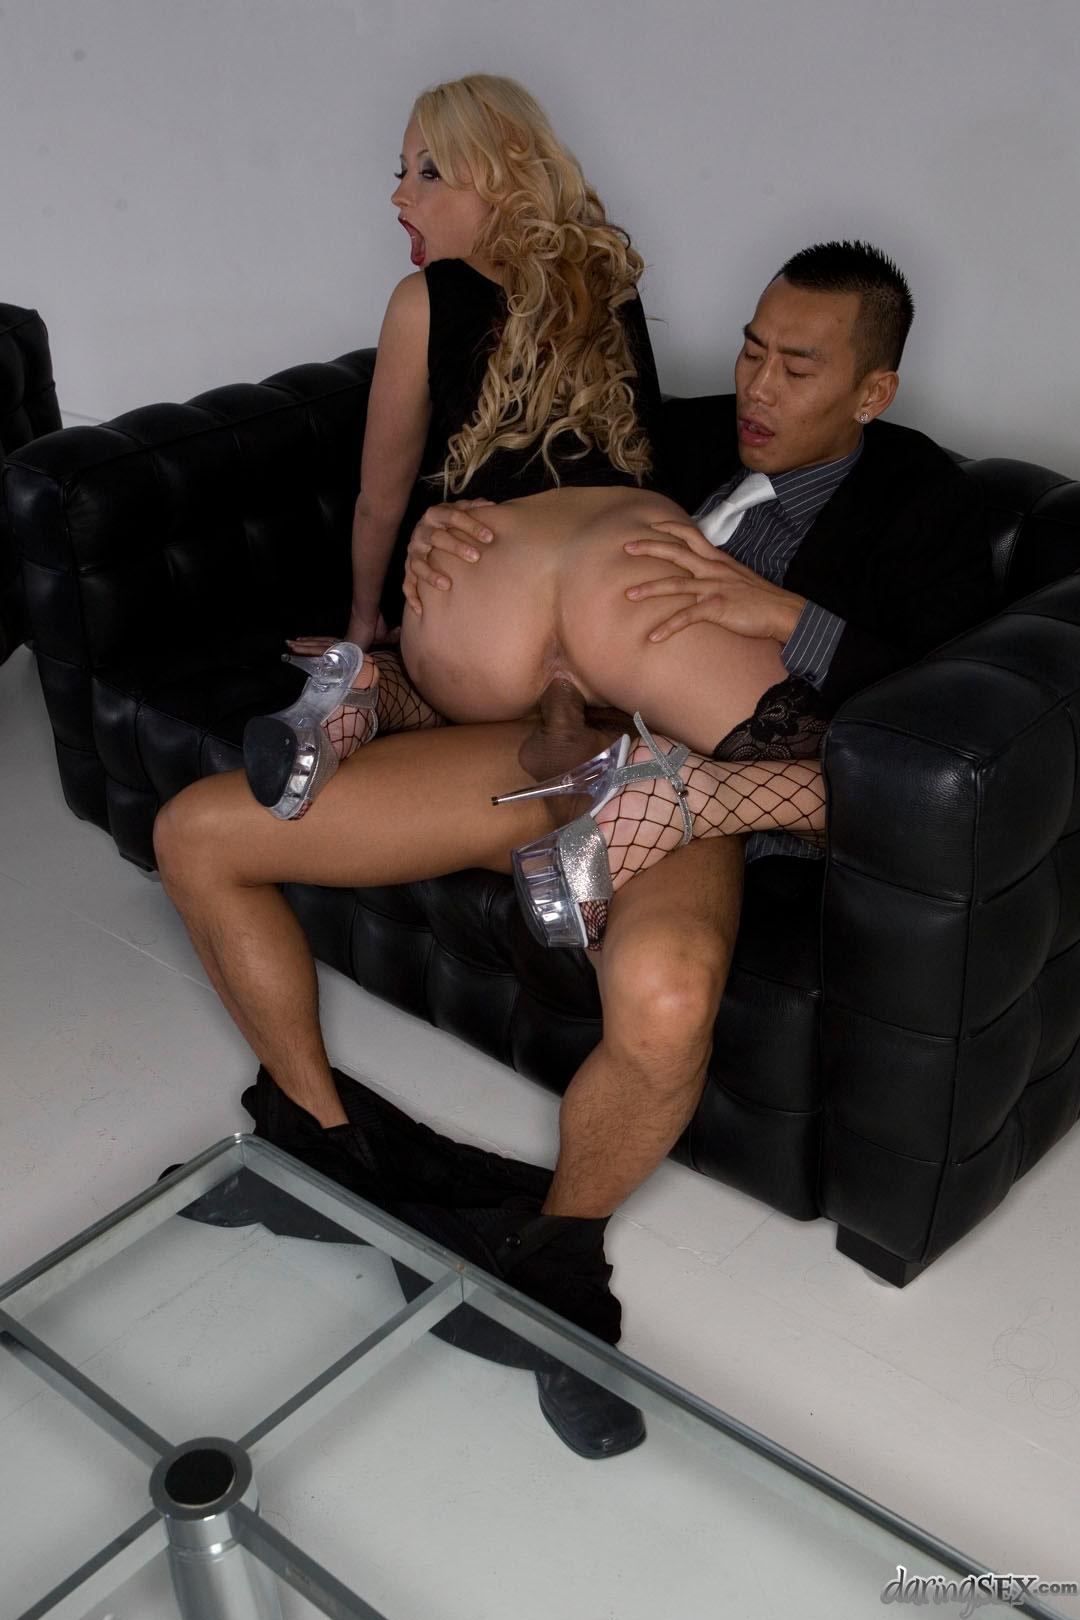 Таксит уговорил девушку на секс 12 фотография